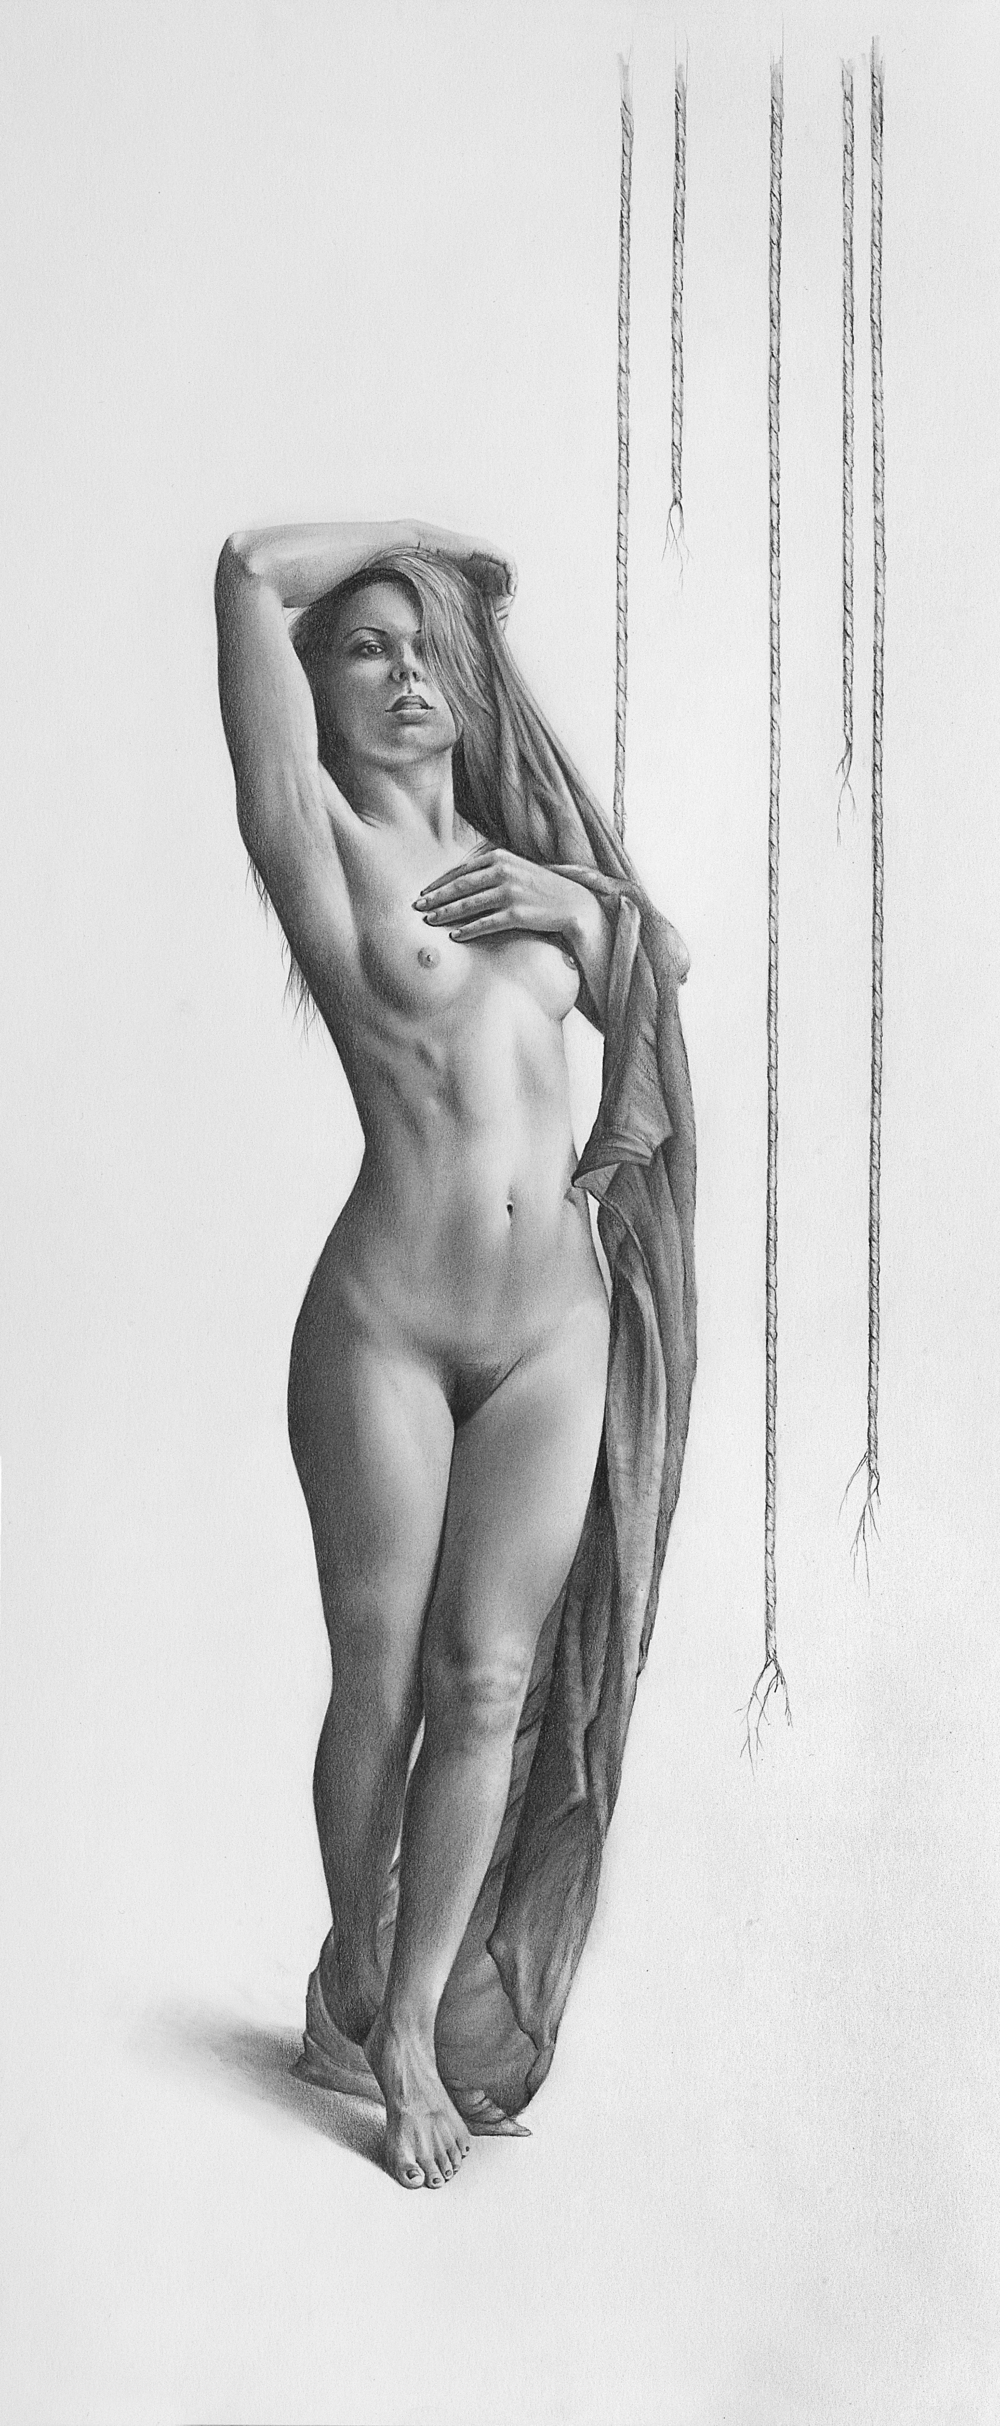 momentum-bill-higginson-artist-graphite-drawing-realism-black-and-white